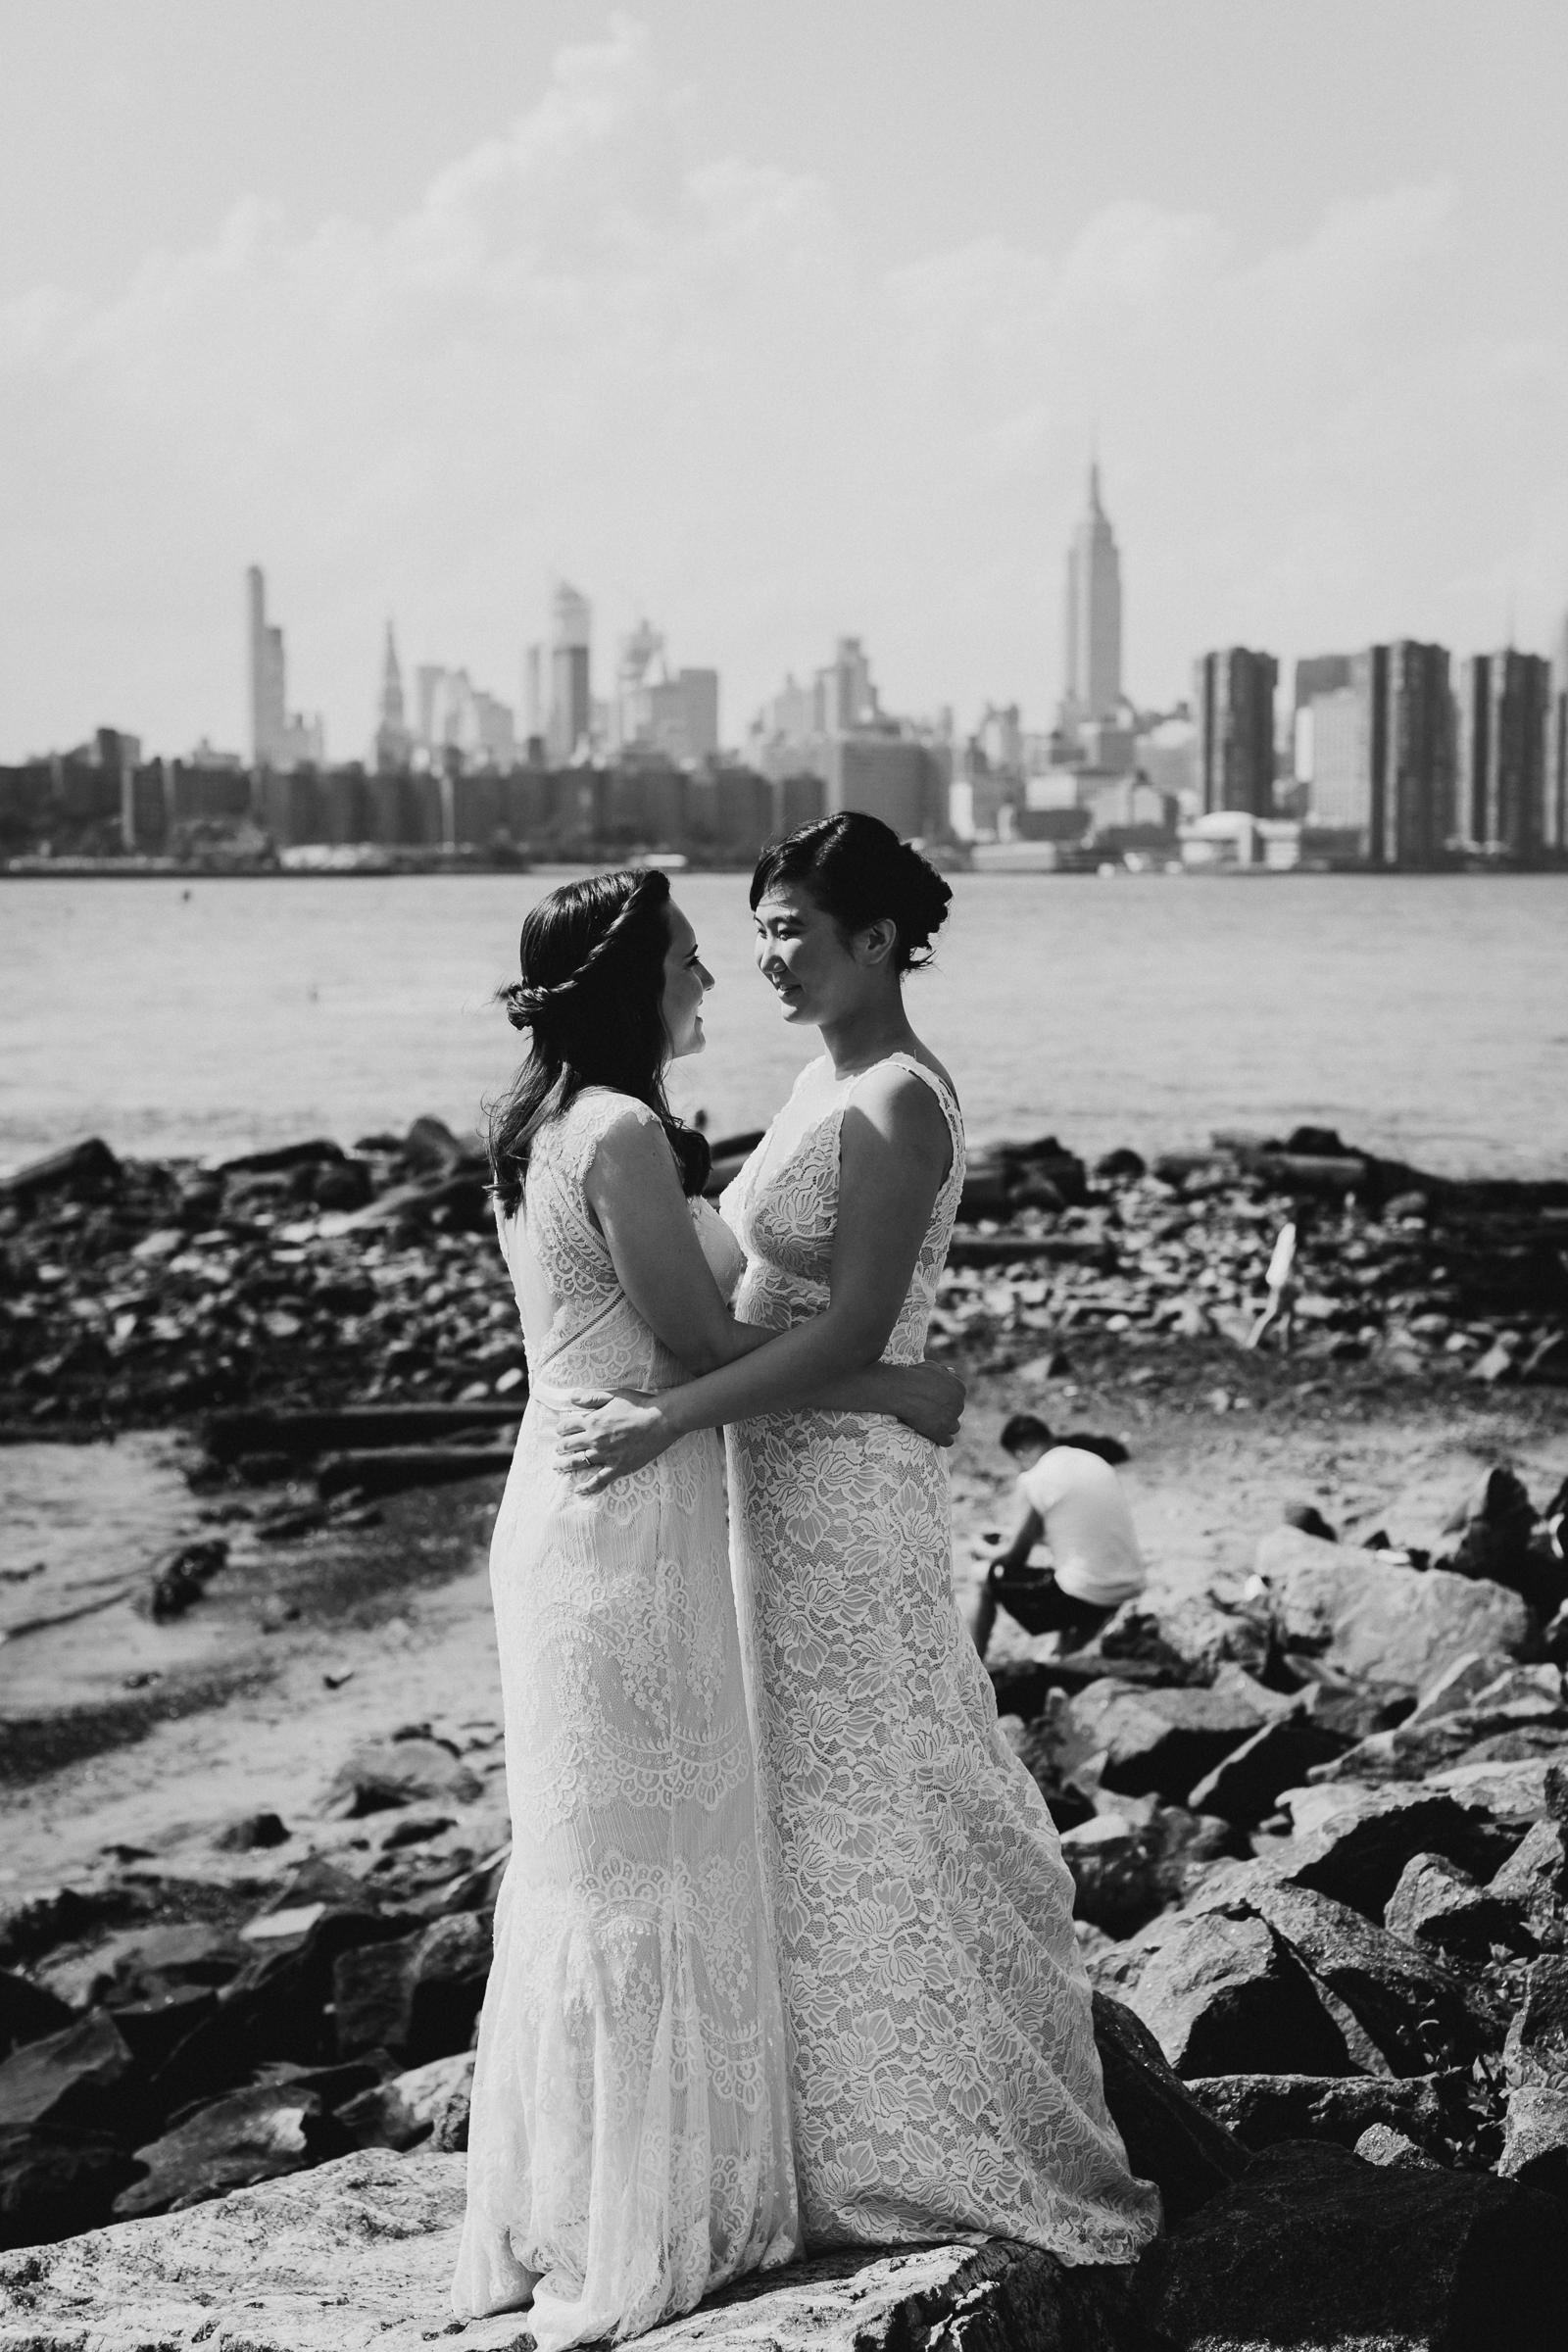 My-Moon-Brooklyn-LGBT-Gay-Documentary-Wedding-Photographer-33.jpg